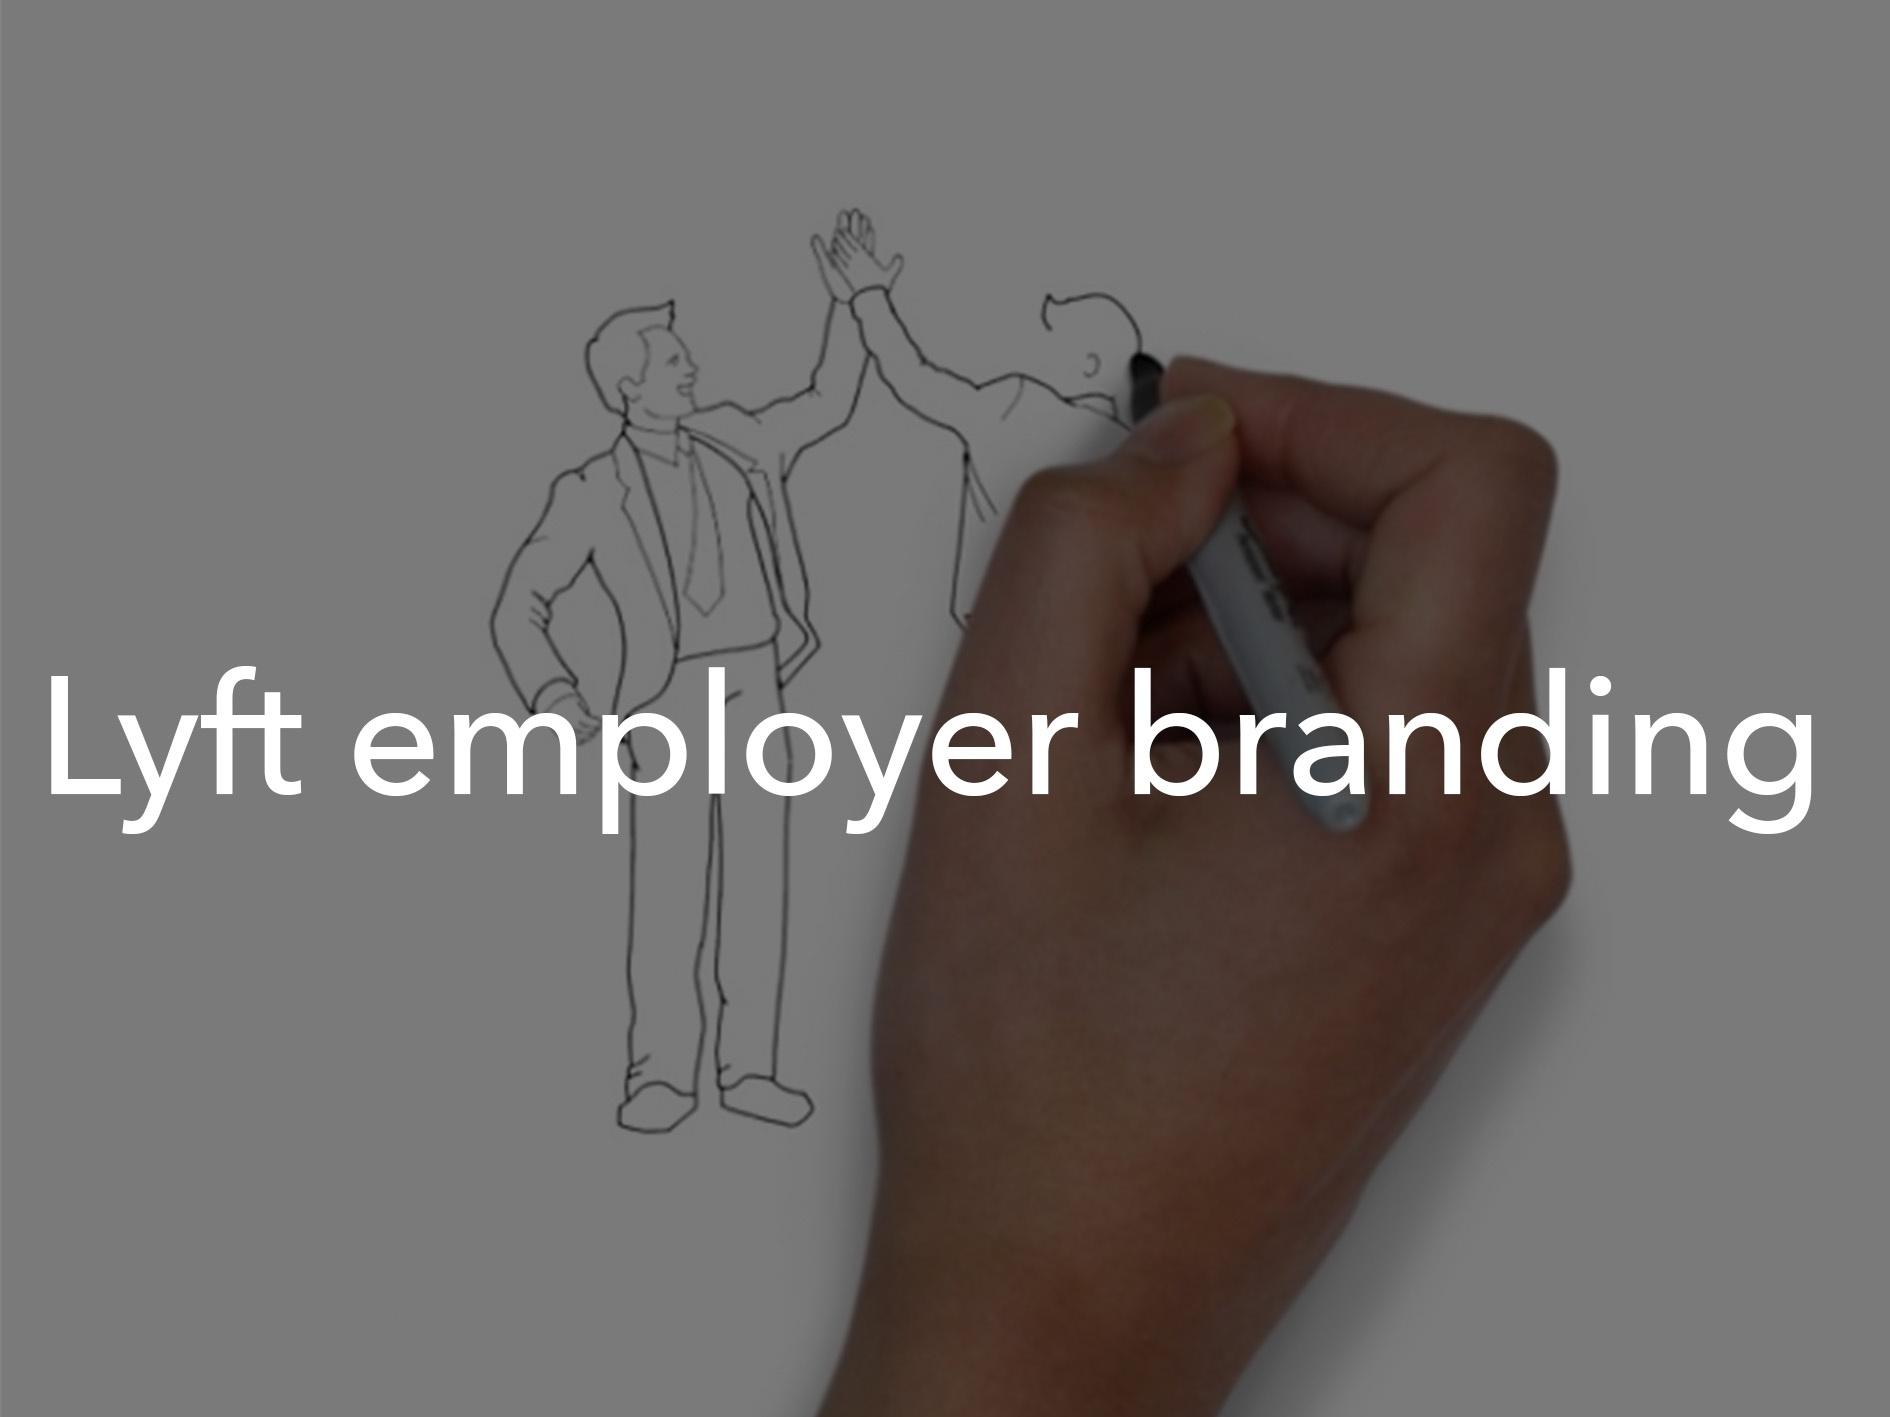 Lyft employer branding